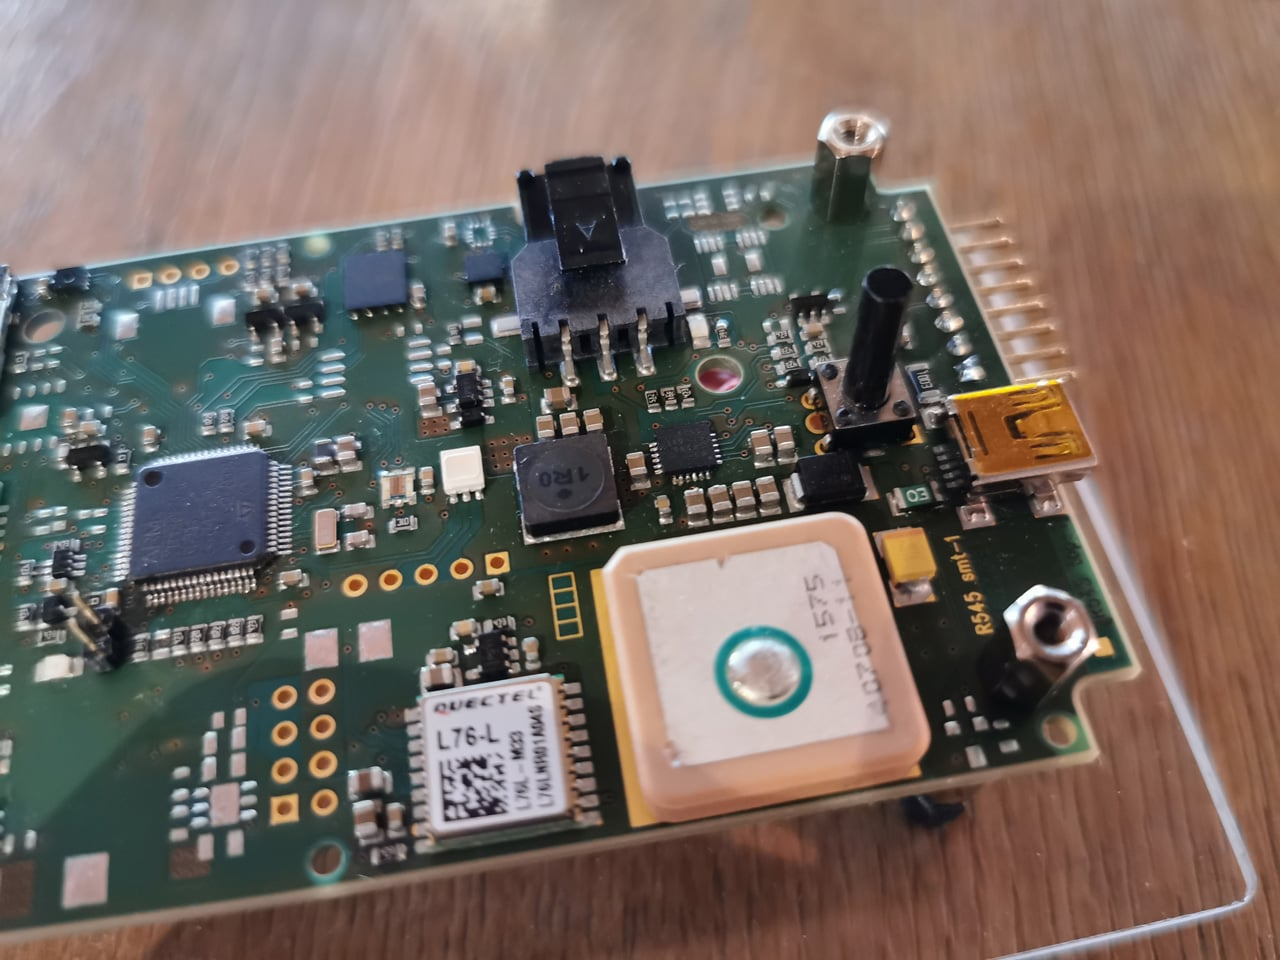 Prototypovací IoT modul od M2M Communication Holding (M2MC)